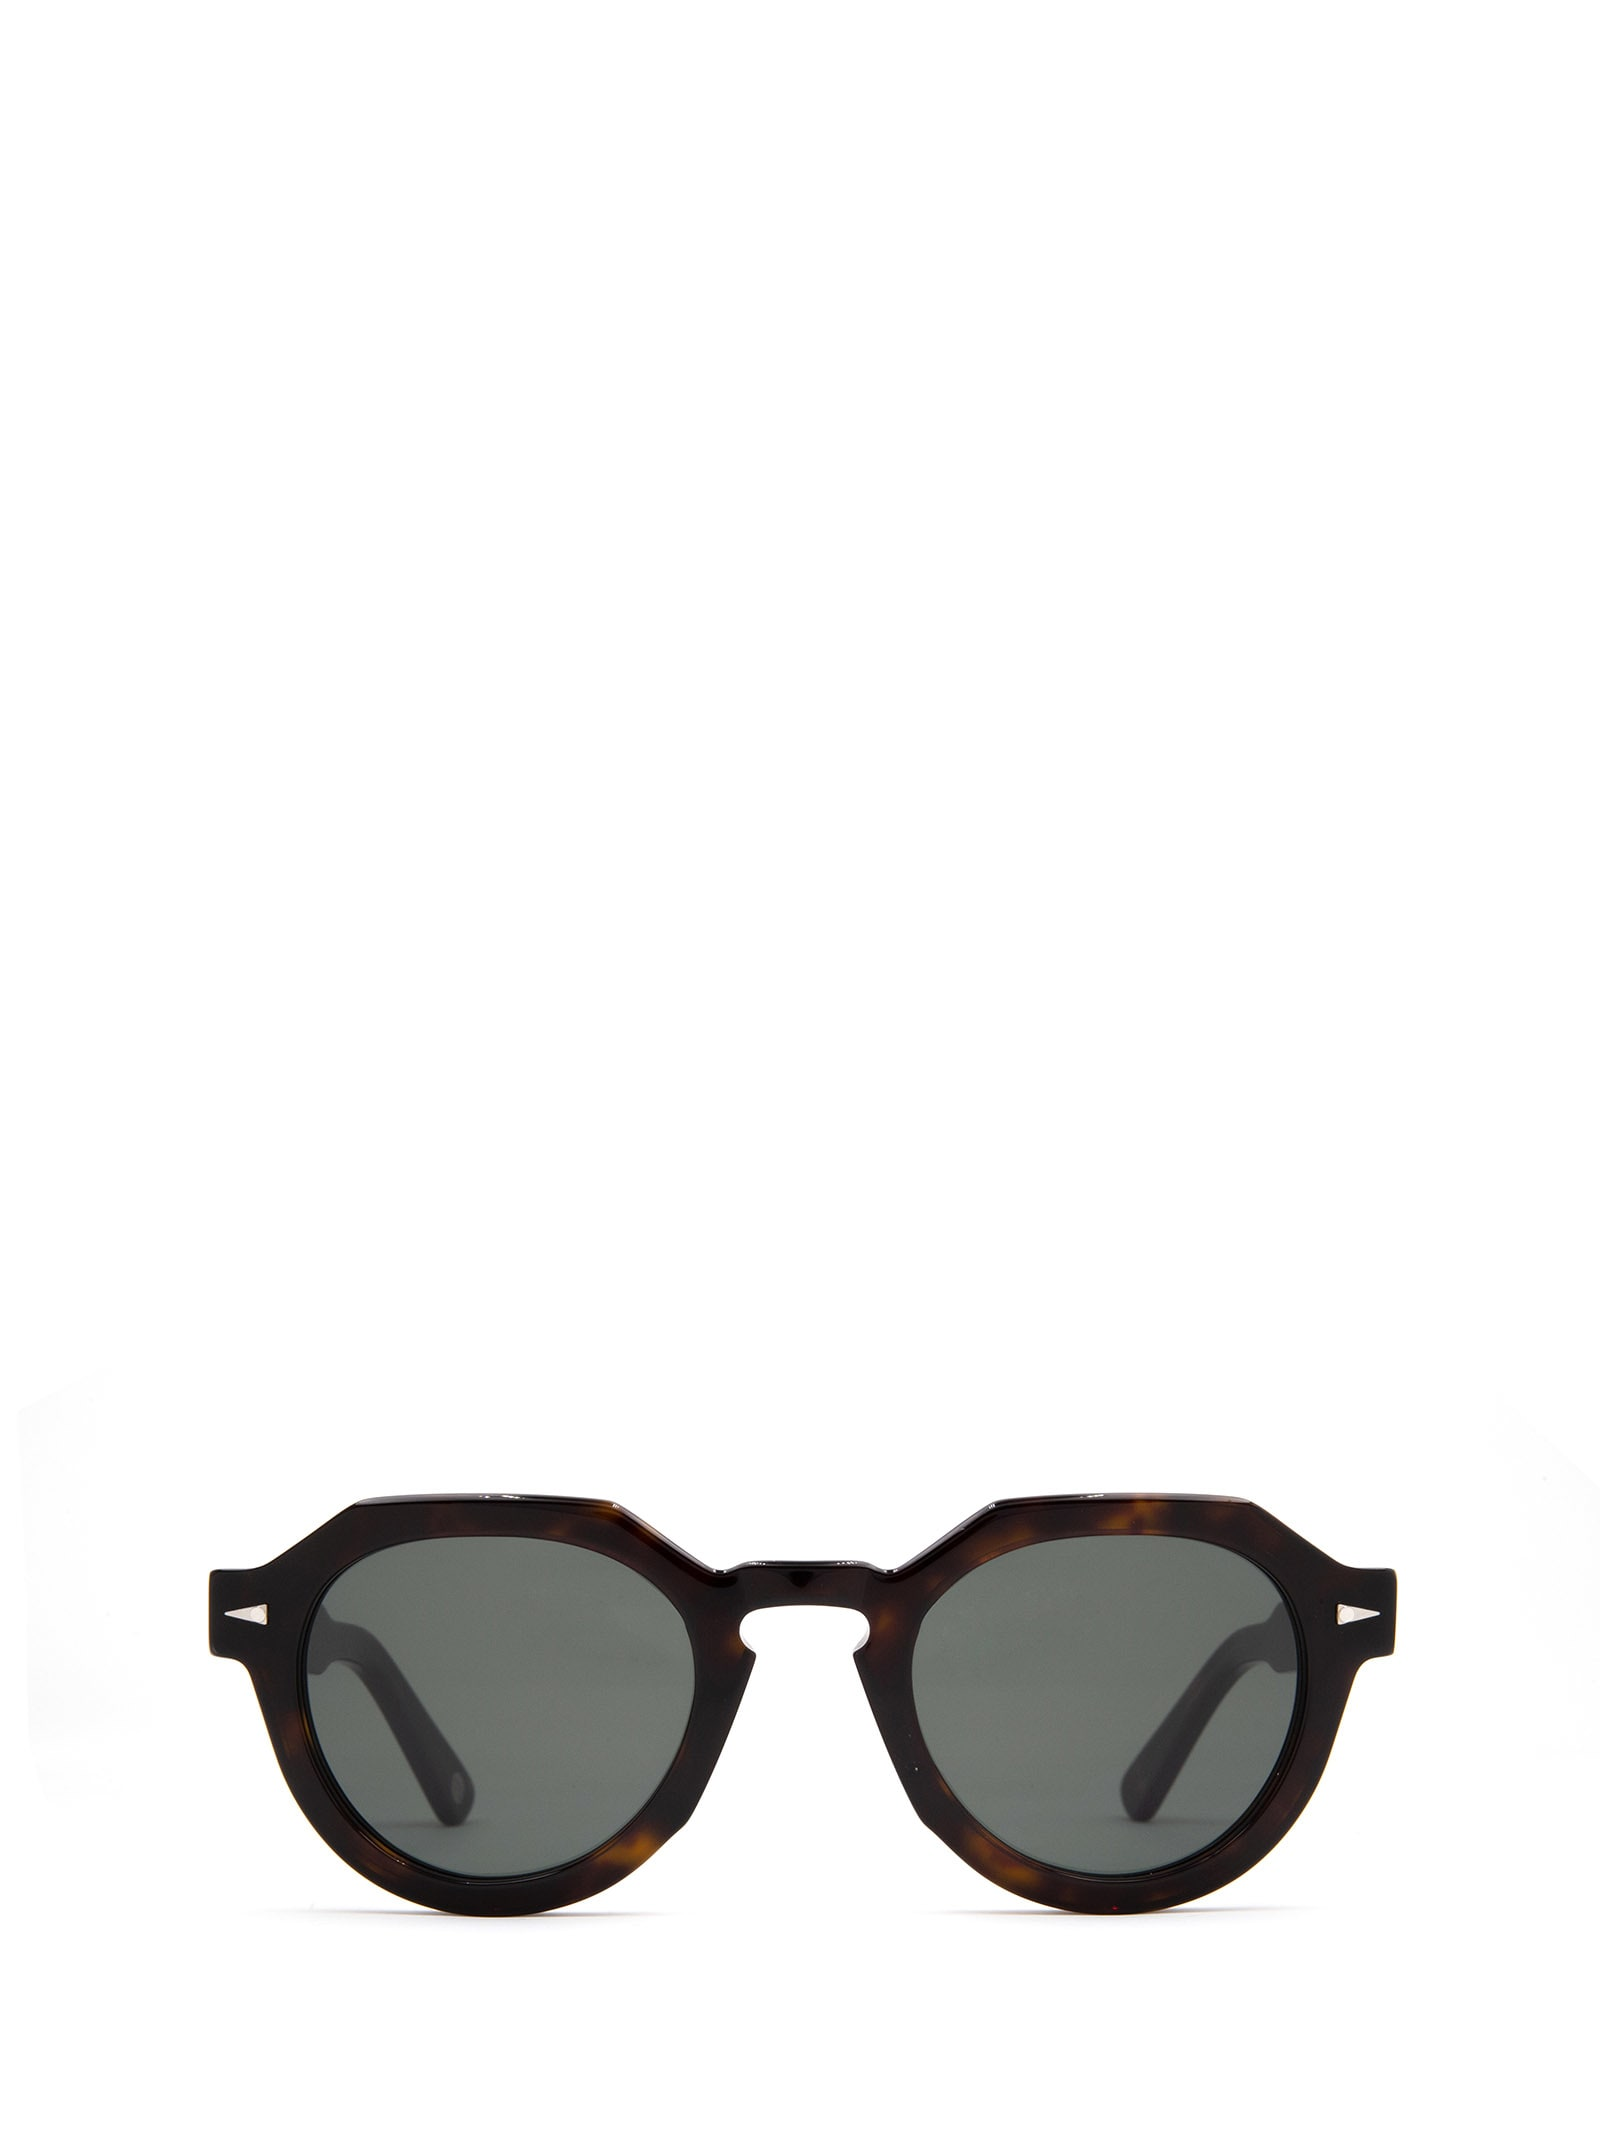 AHLEM Ahlem Grenelle Dark Turtle Sunglasses